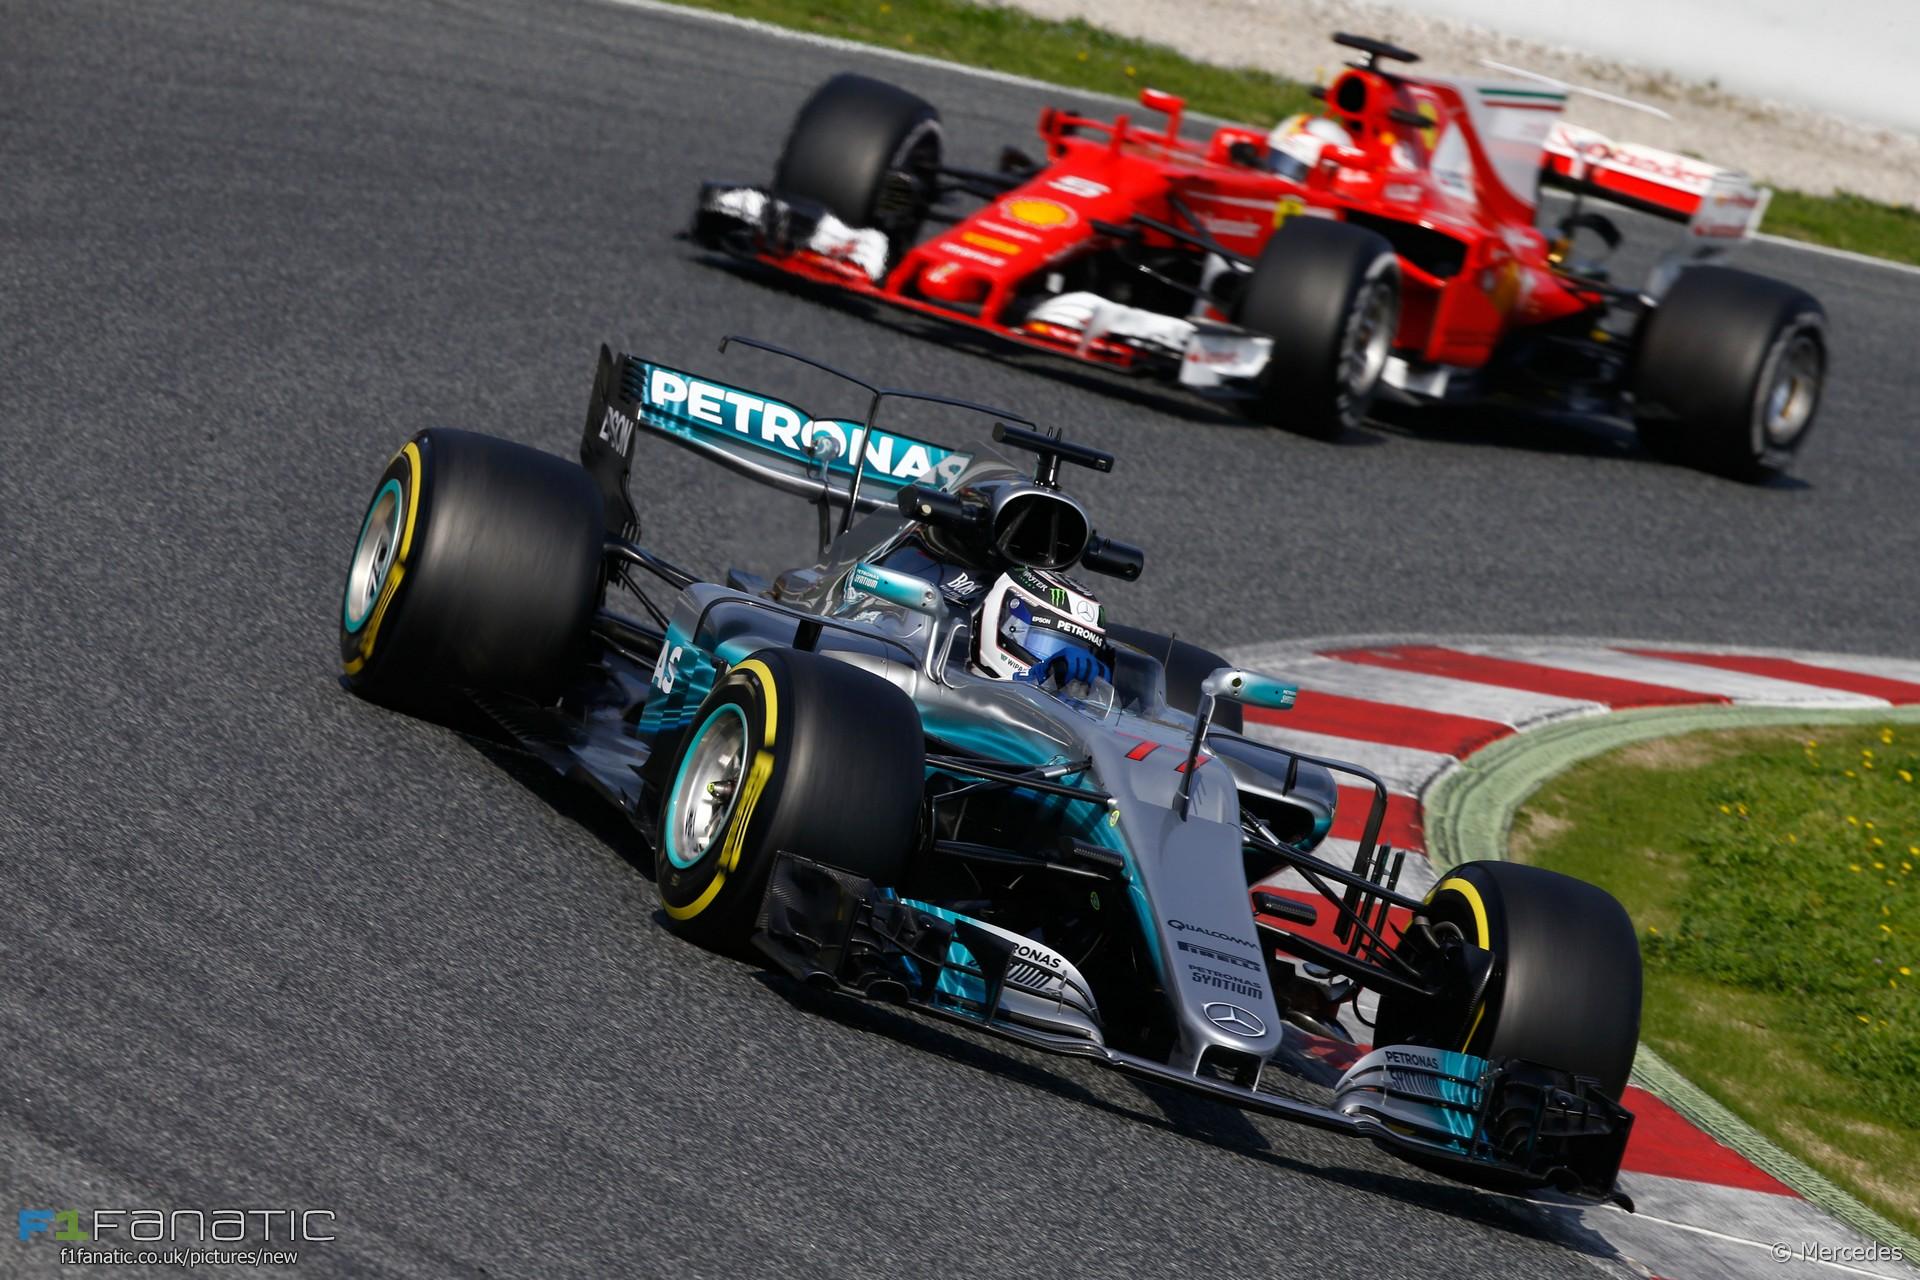 Valtteri Bottas, Sebastian Vettel, Circuit de Catalunya, 2017